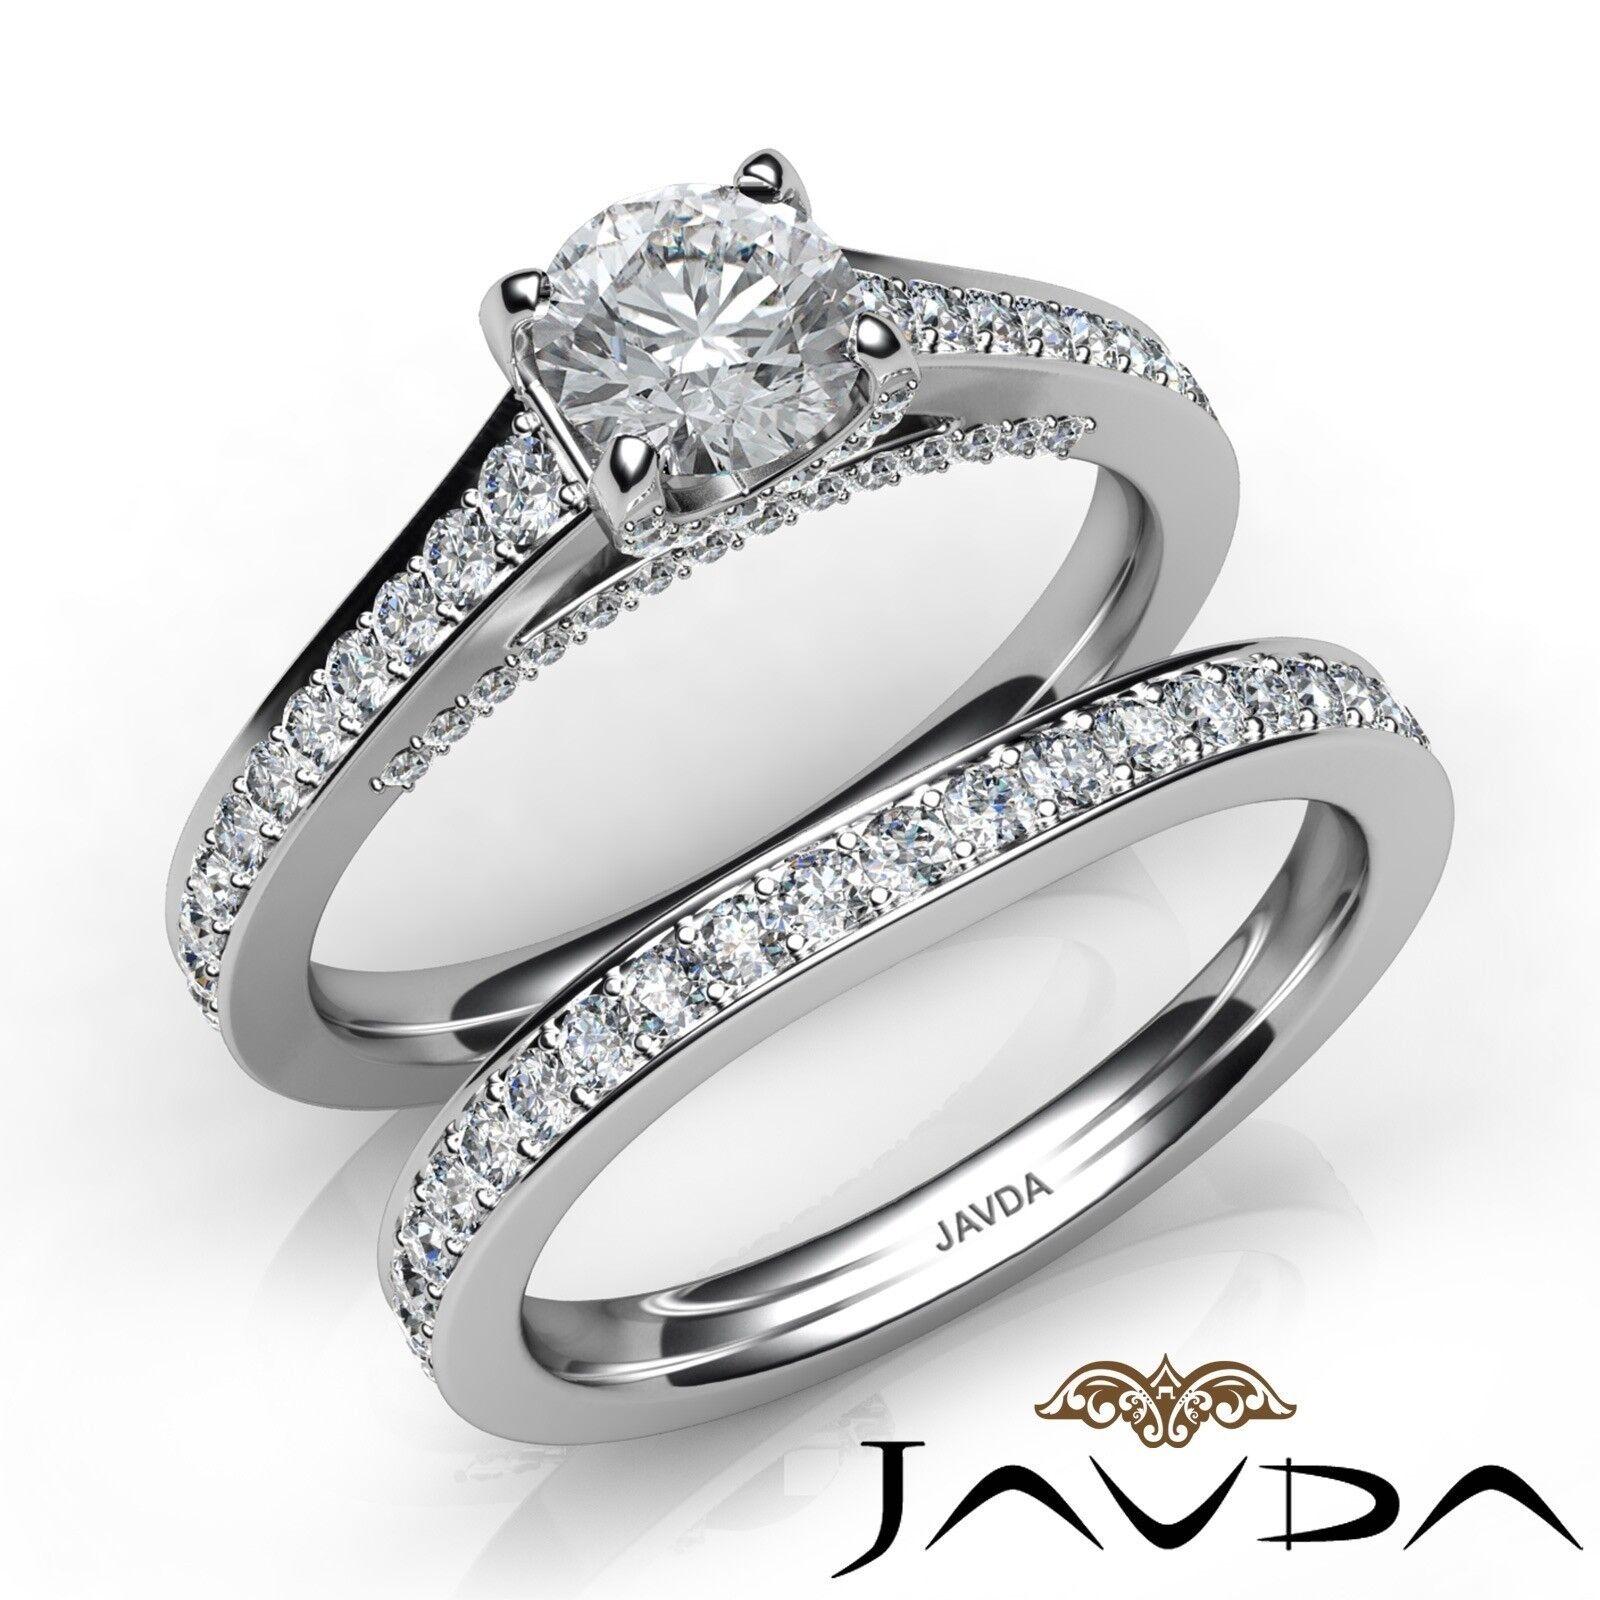 1.7ctw Pave Classic Bridal Set Round Diamond Engagement Ring GIA E-VVS2 W Gold